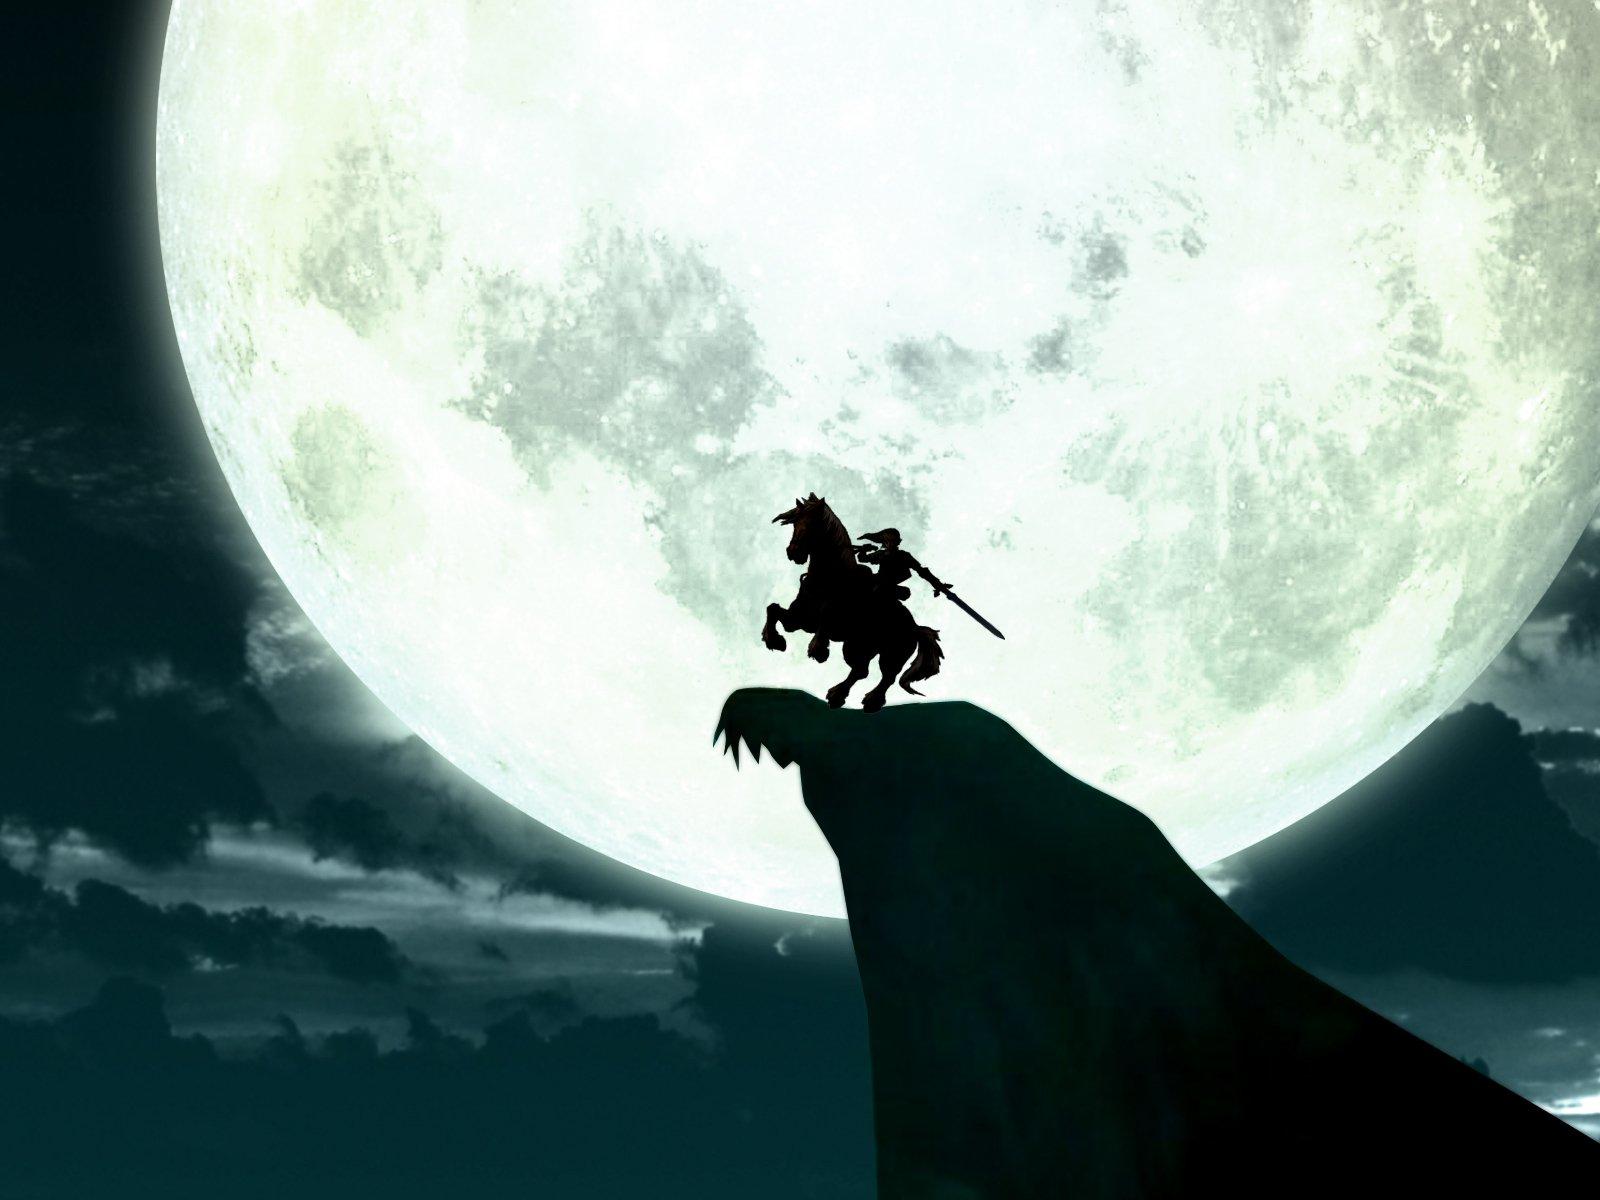 Video Game - The Legend Of Zelda: Twilight Princess  Link Epona (The Legend of Zelda) Wallpaper